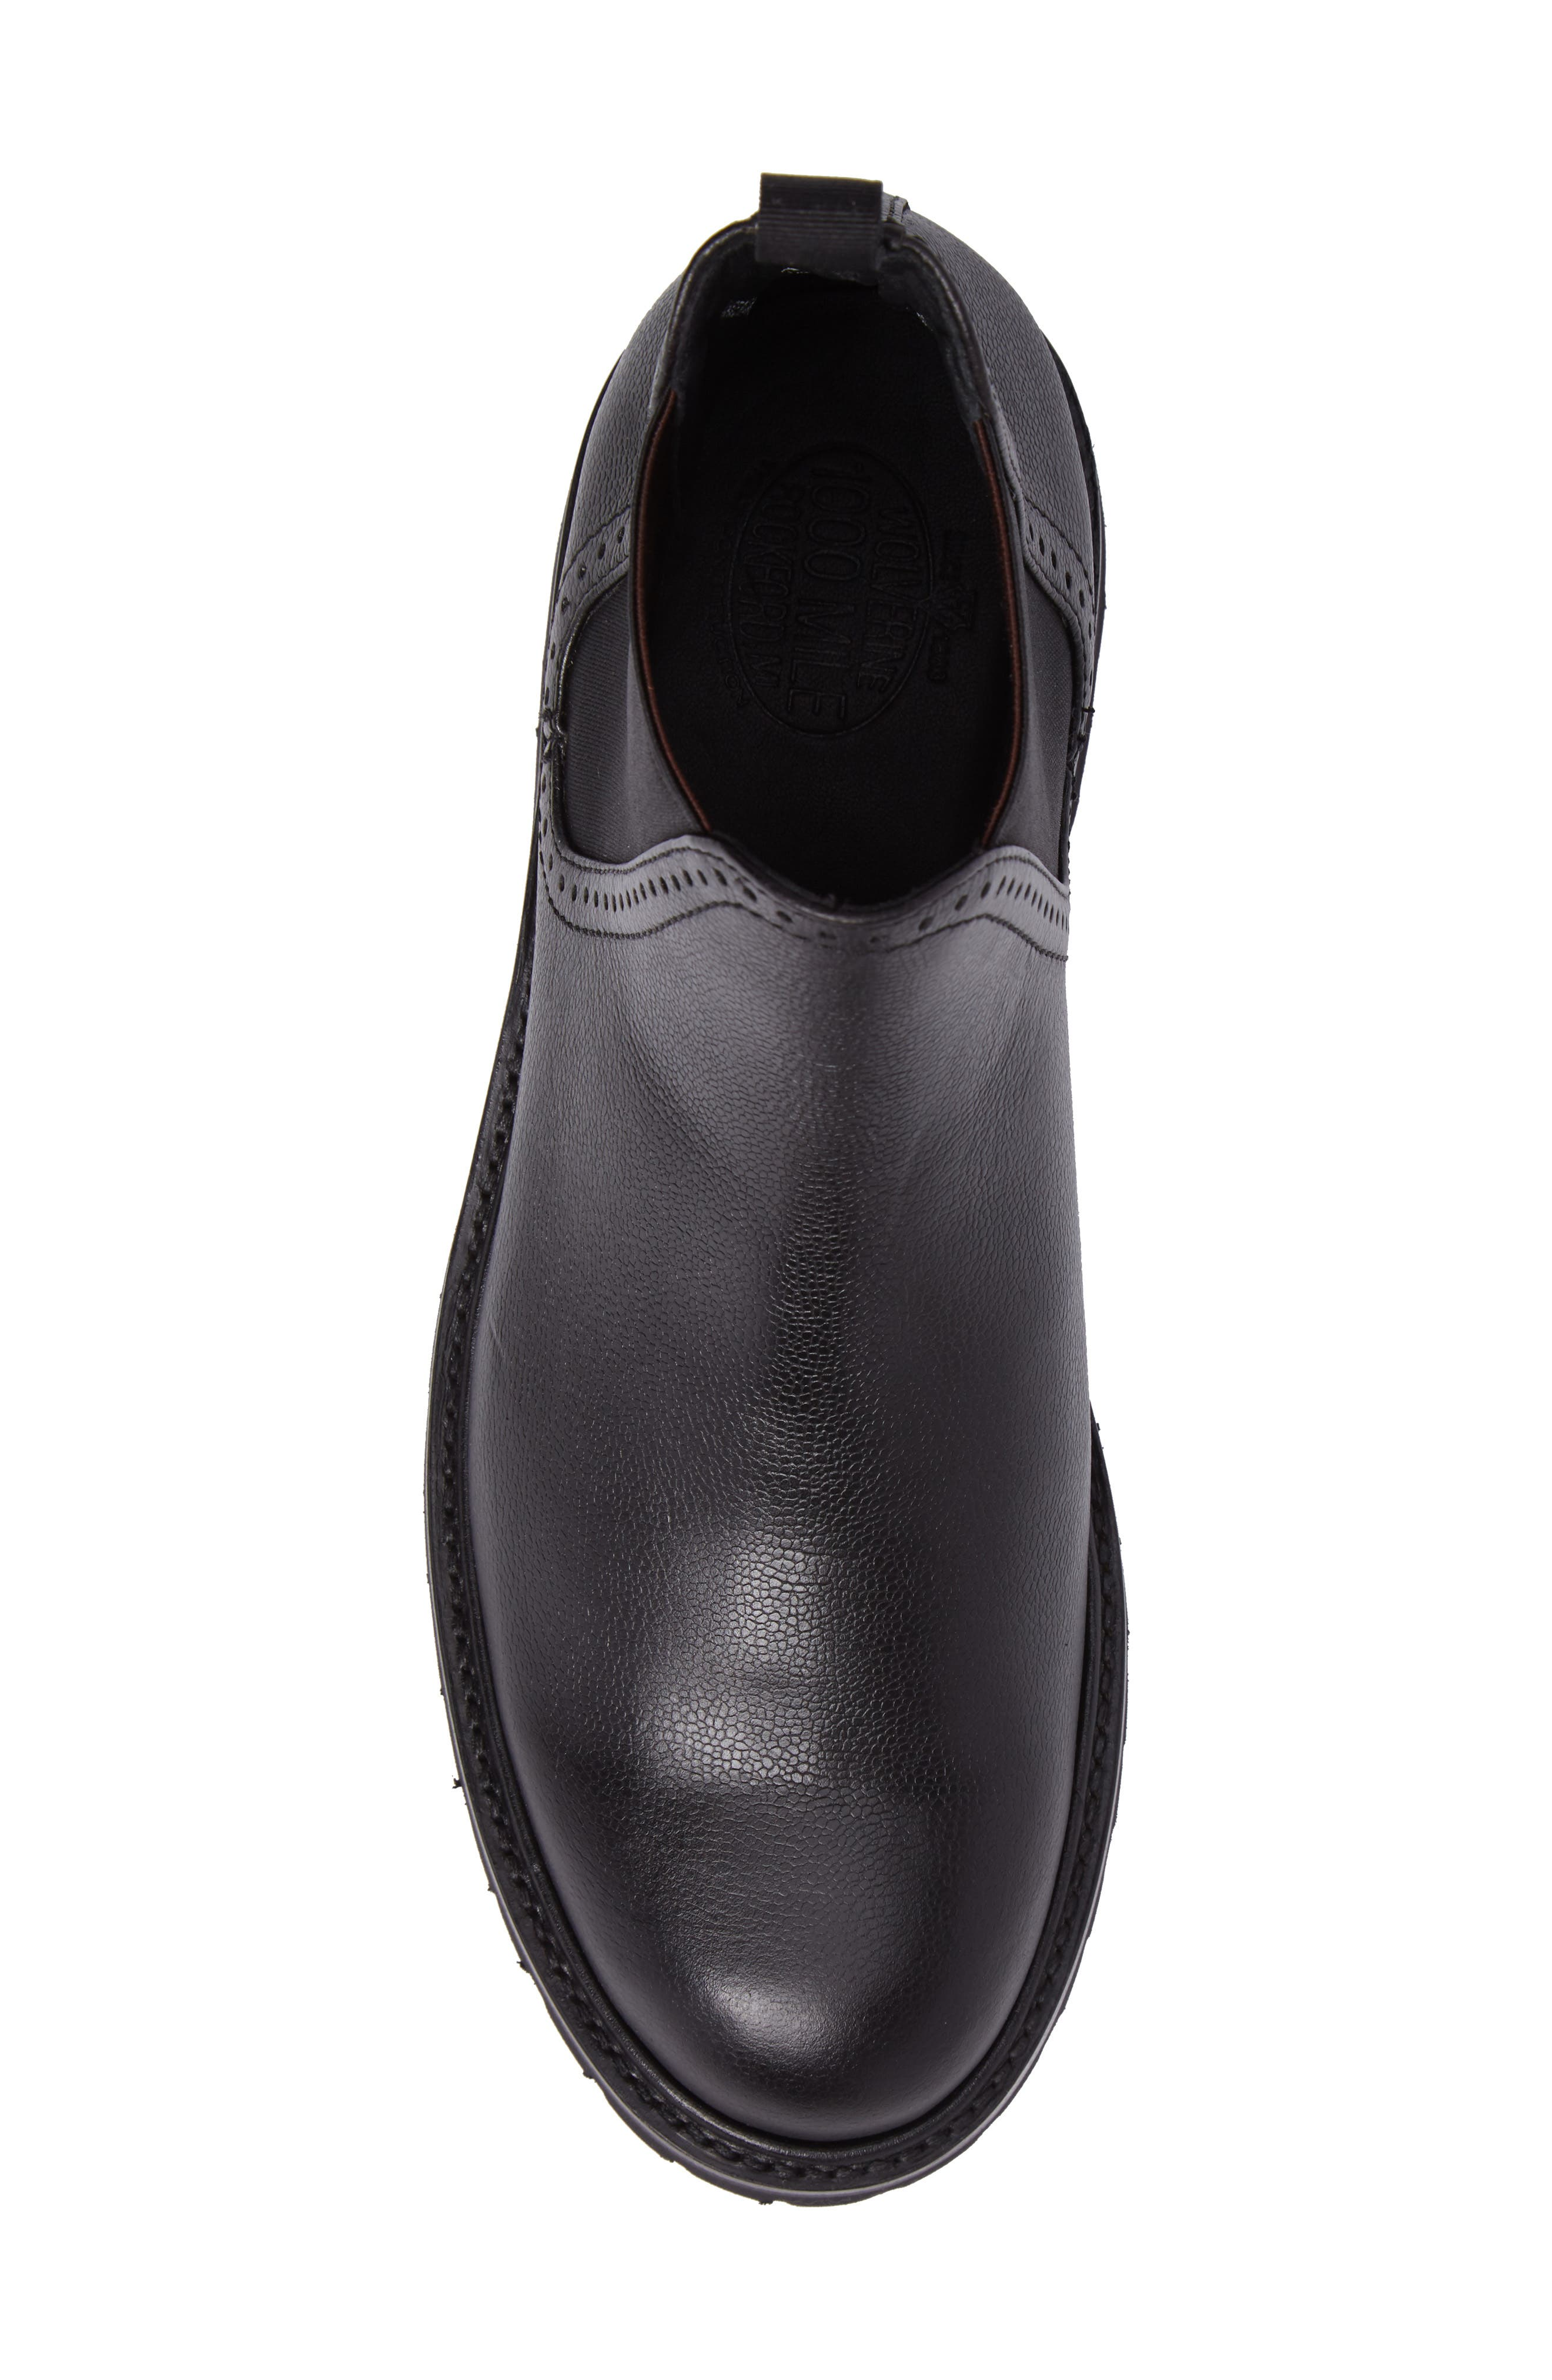 Cromwell Chelsea Boot,                             Alternate thumbnail 5, color,                             Black